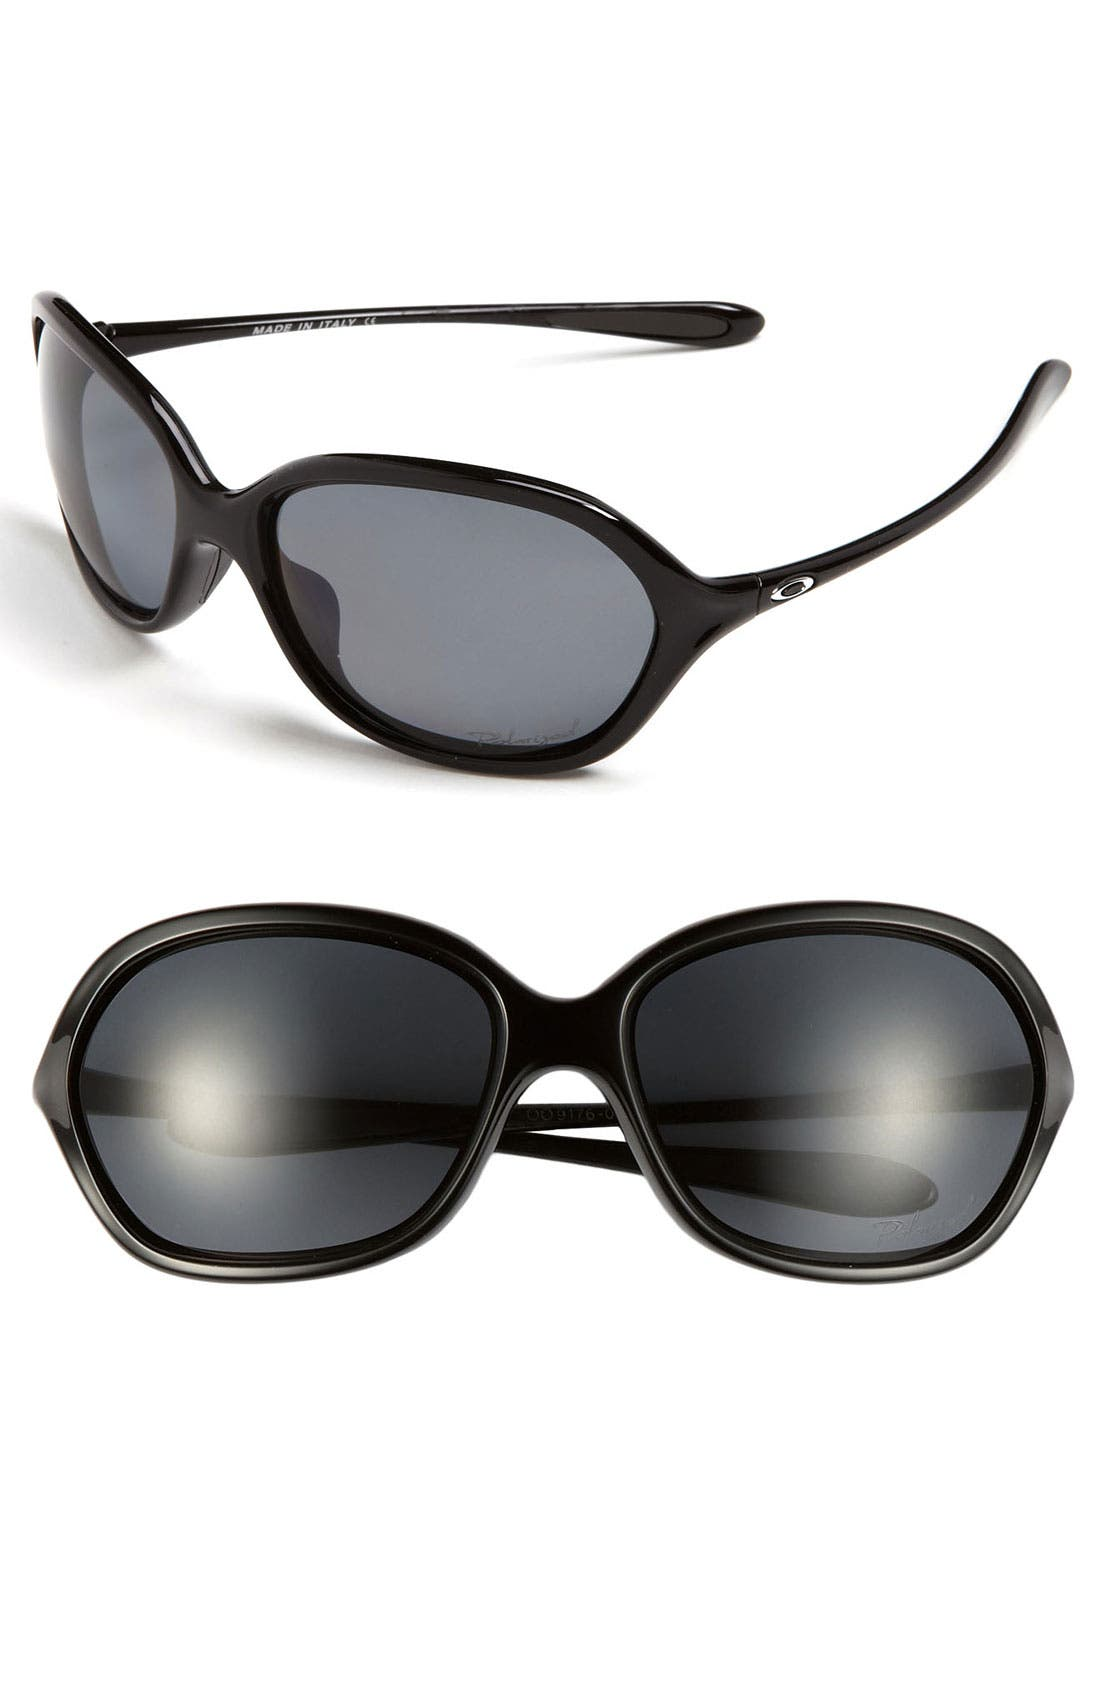 Alternate Image 1 Selected - Oakley 'Warm Up' 60mm Polarized Sunglasses